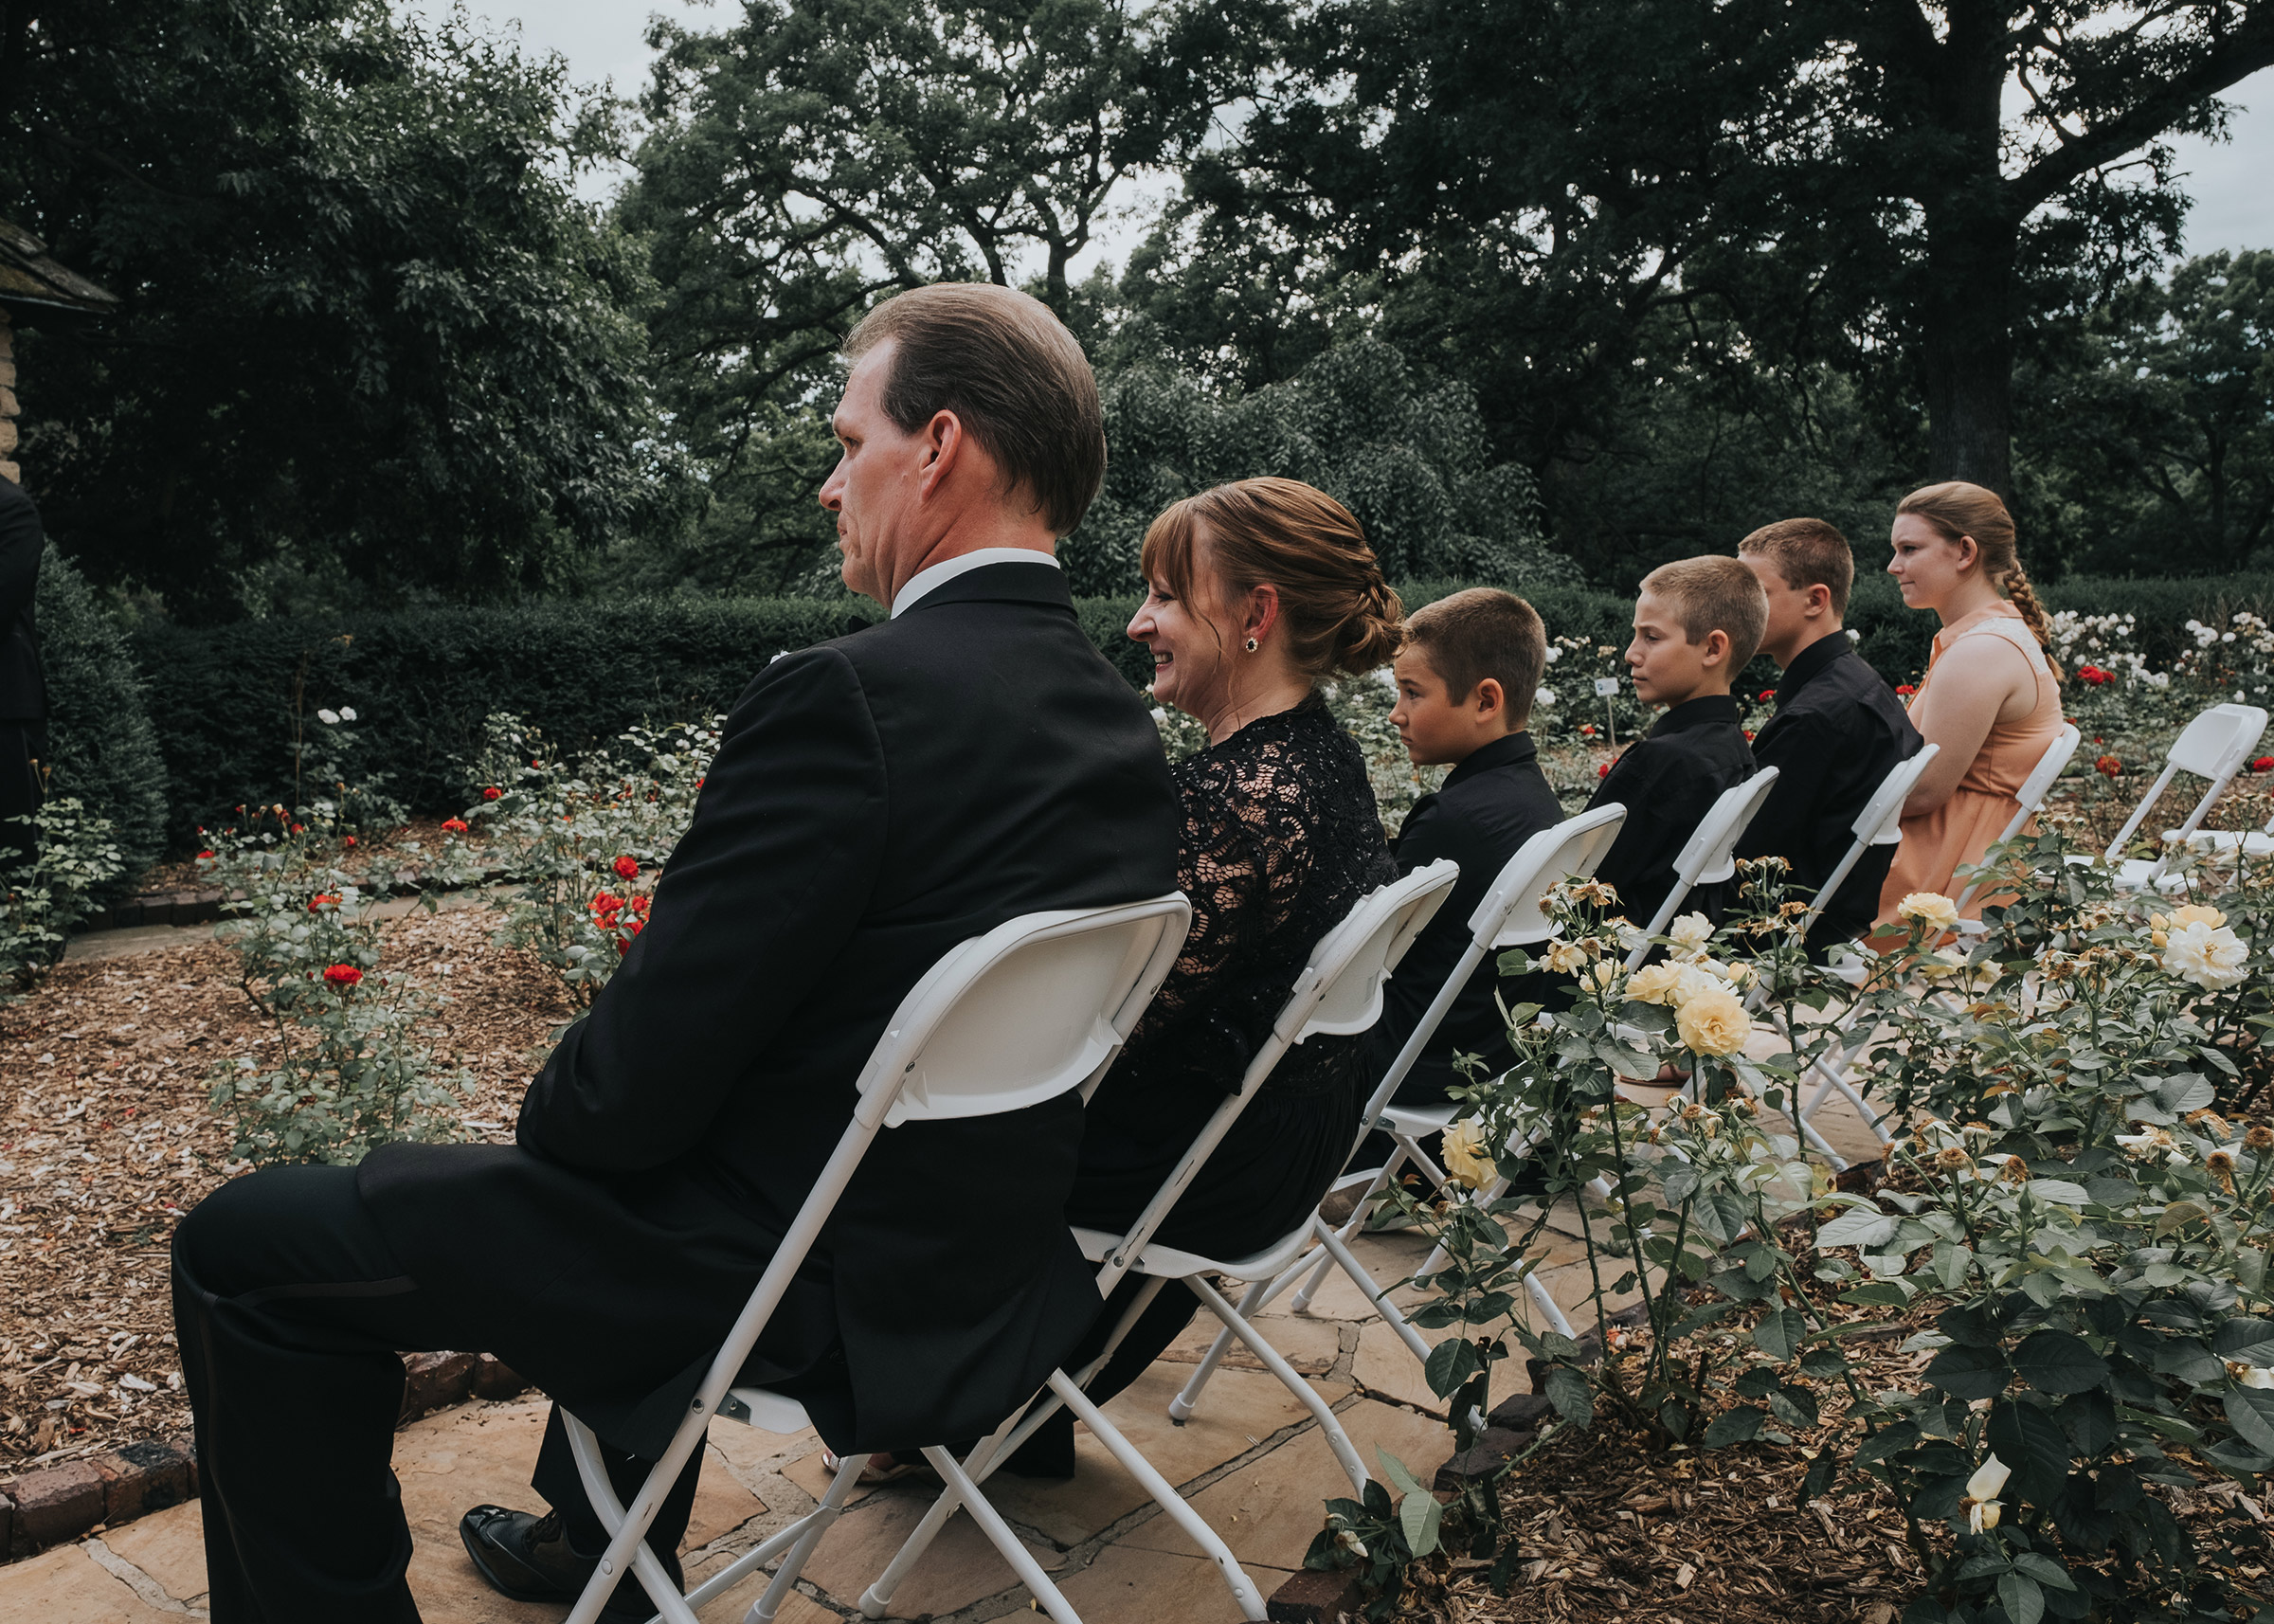 parents-watching-ceremony-desmoines-iowa-rose-garden-raelyn-ramey-photography.jpg